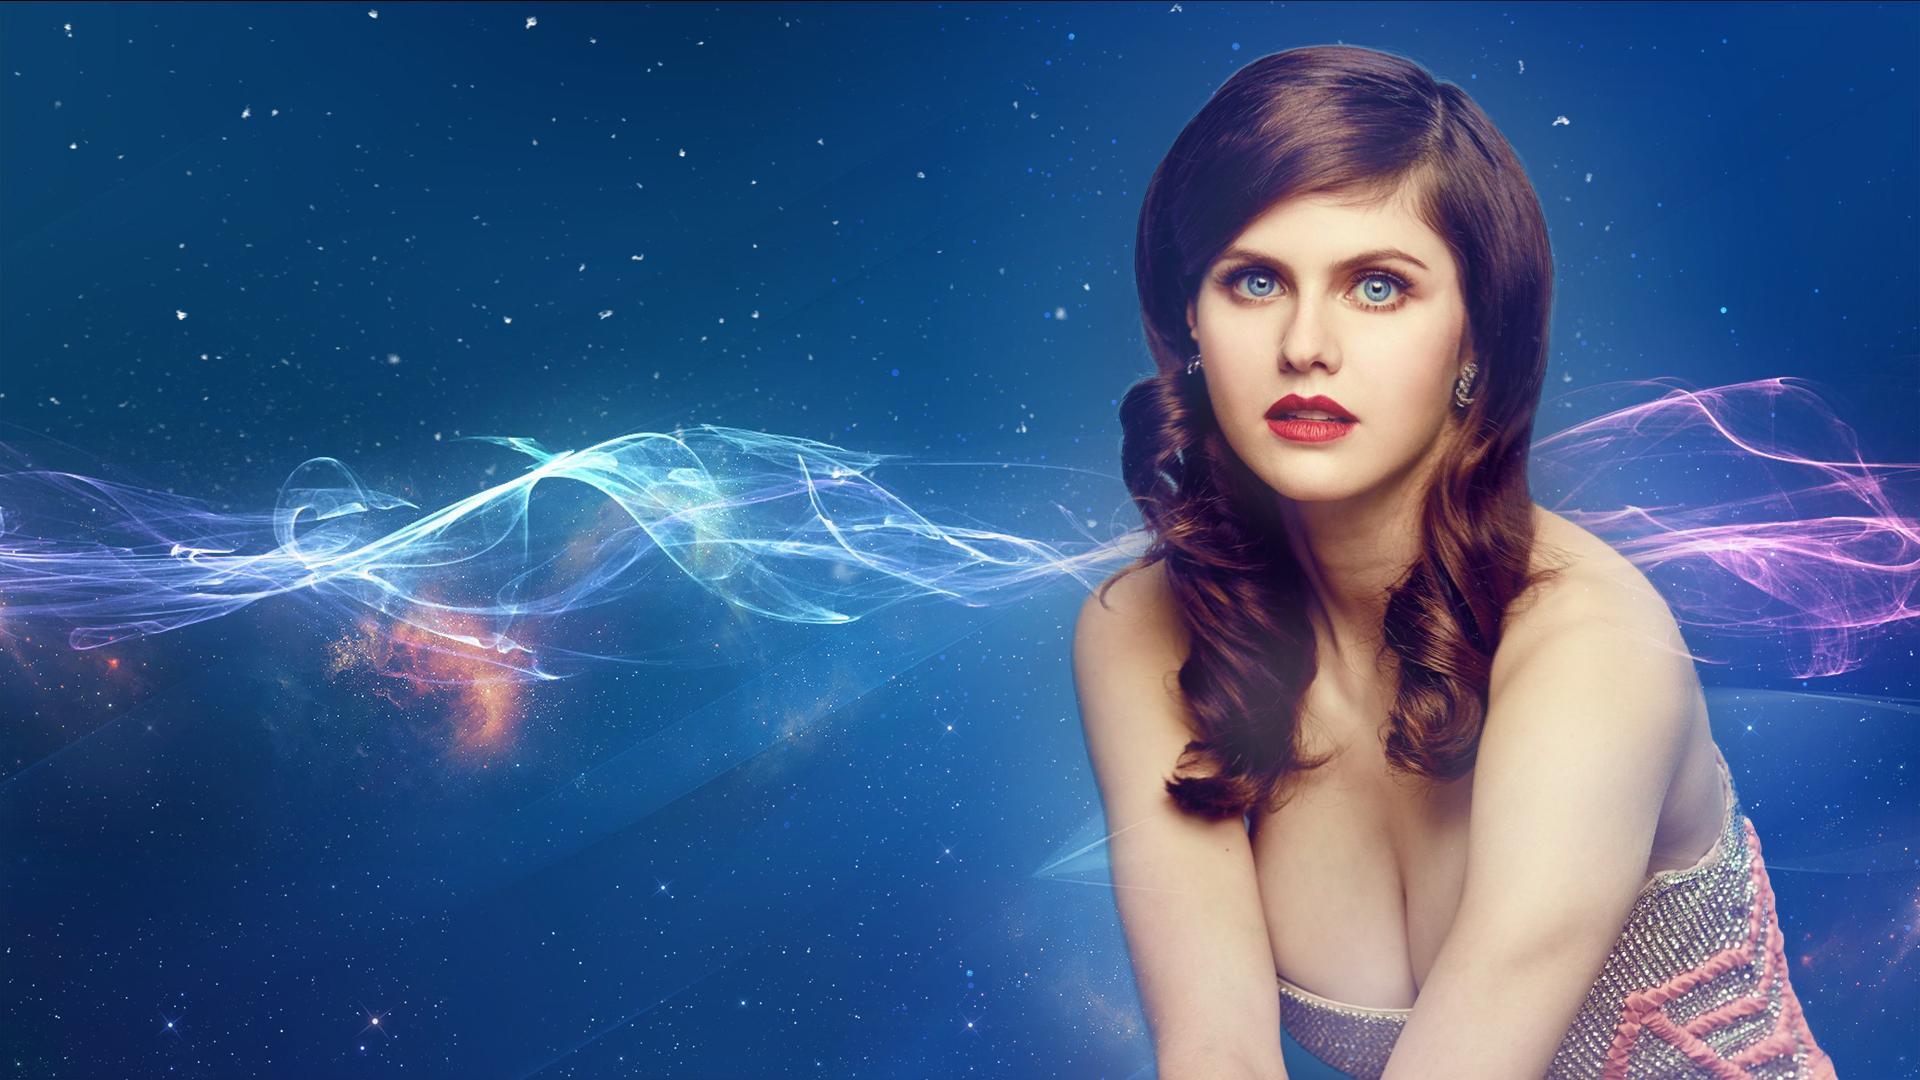 Wallpaper Alexandra Daddario Women Blue Eyes 1920x1080